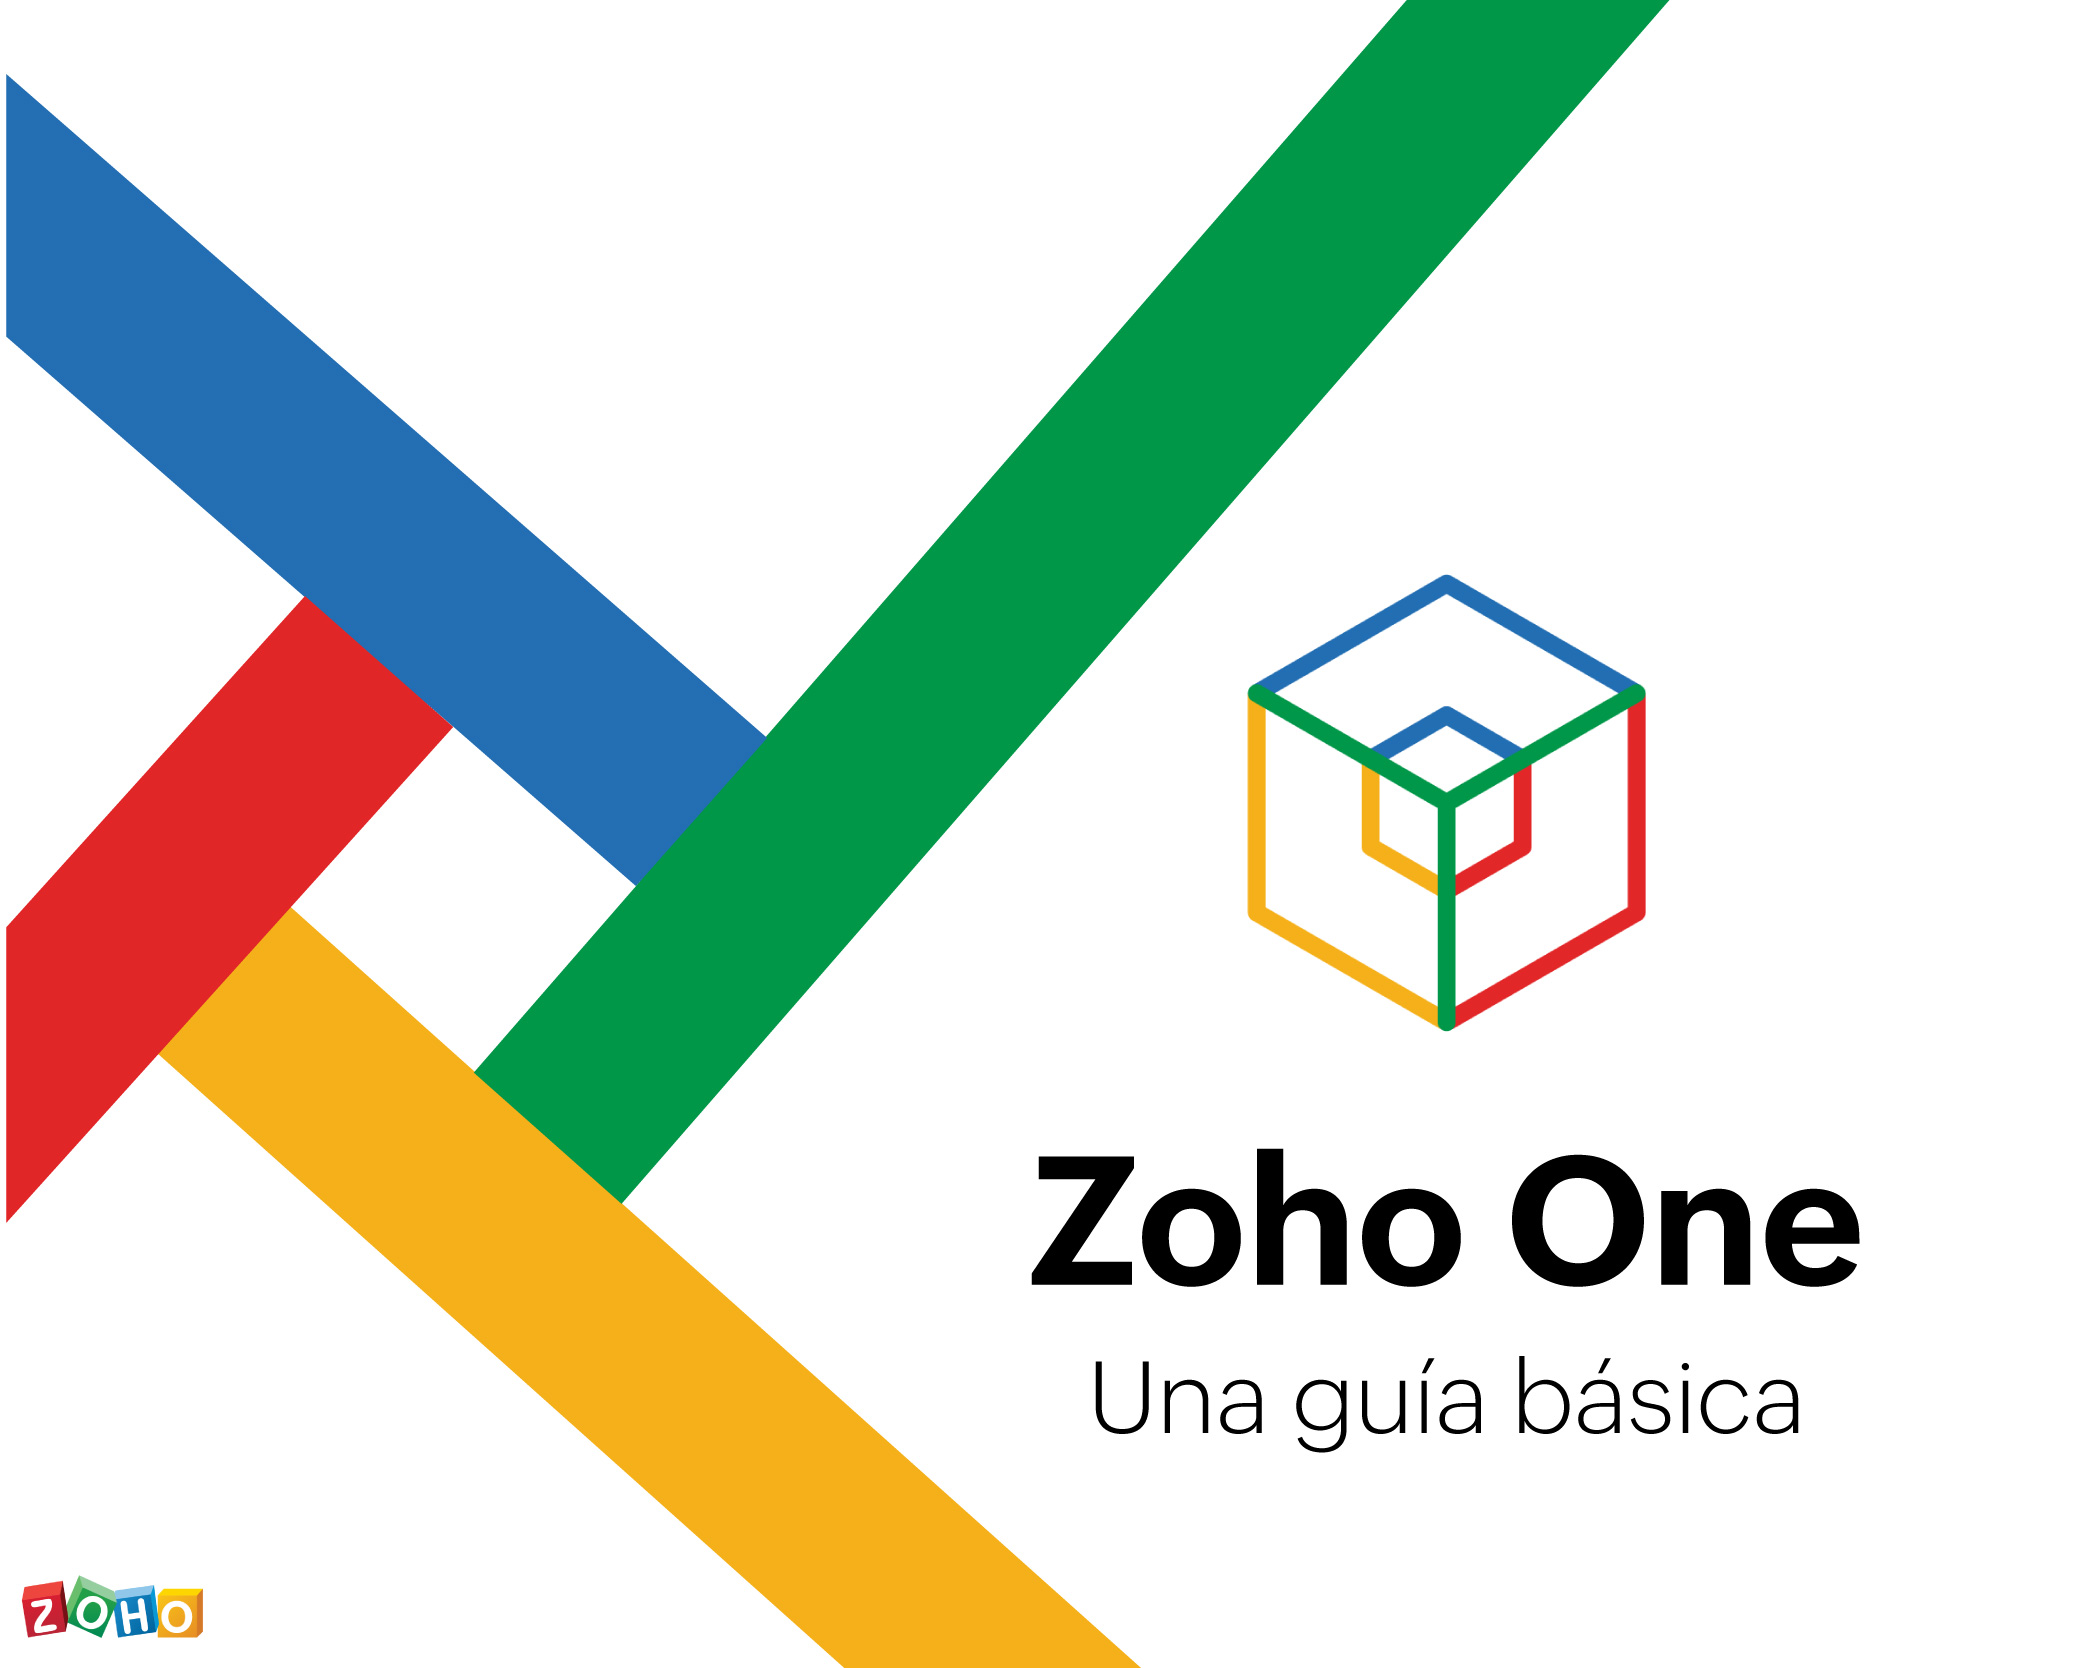 Empezar a usar Zoho One. Una guía básica